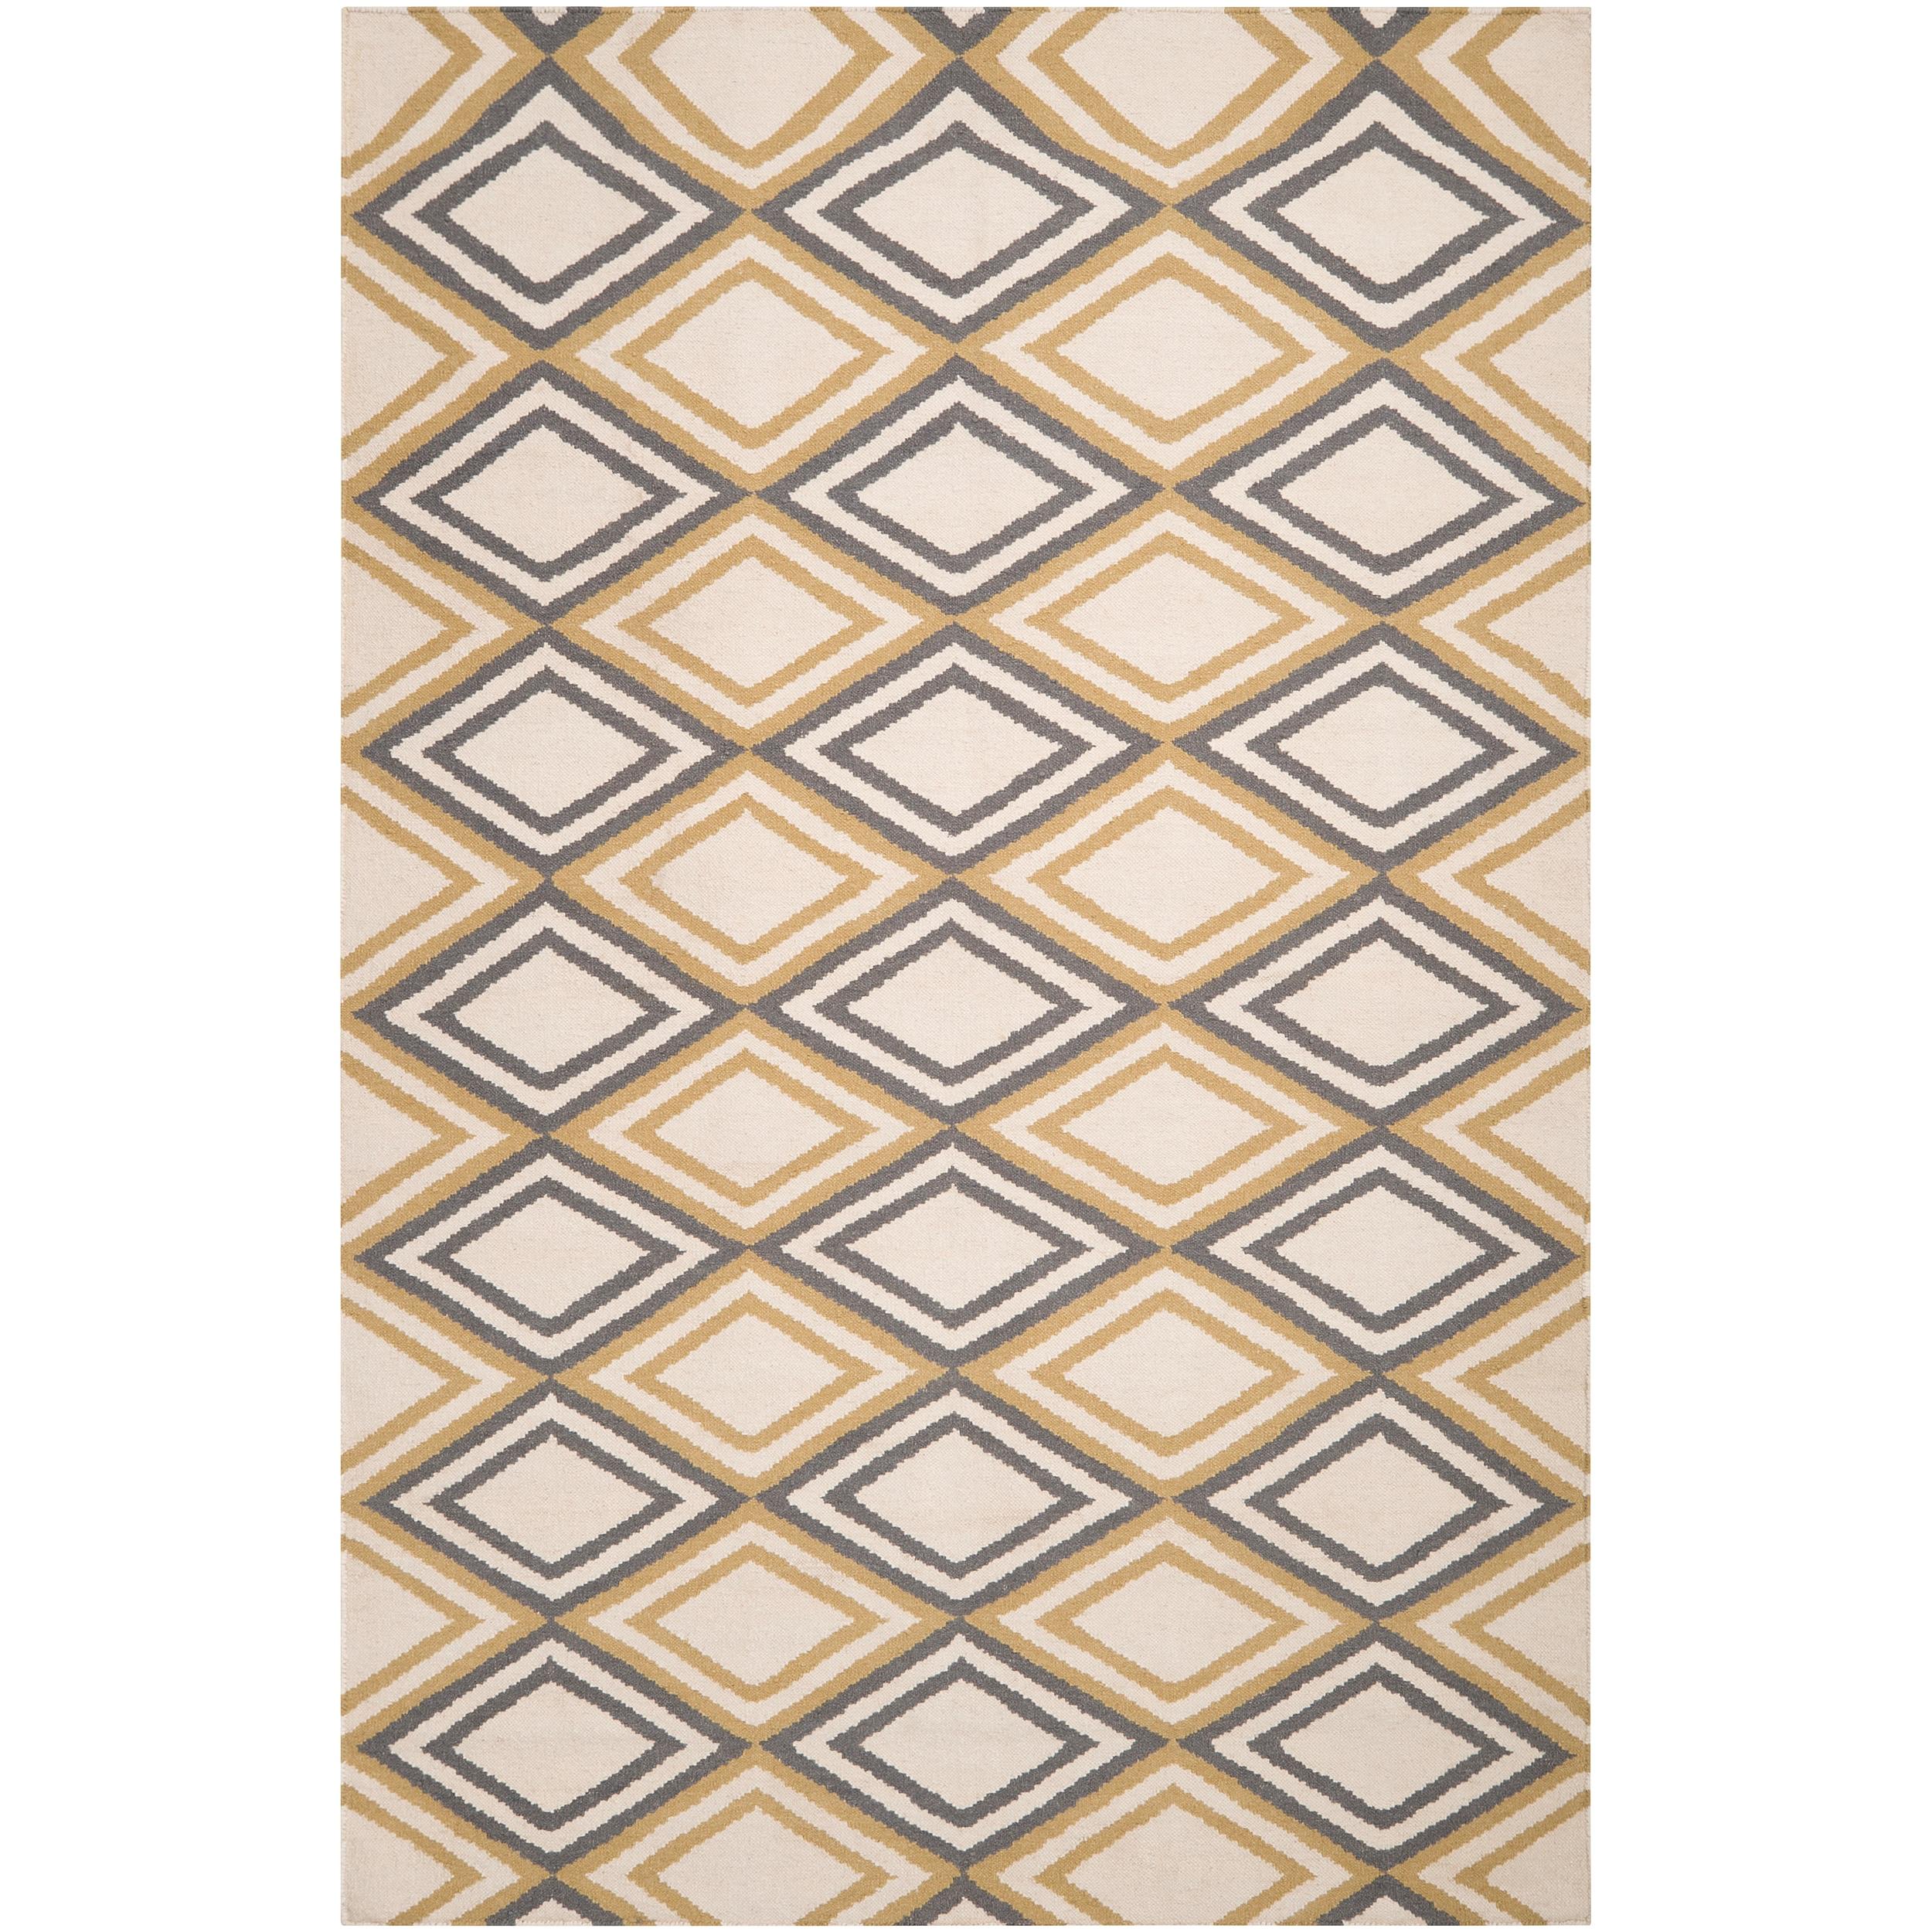 Hand-woven Ivory Foptop Wool Rug (3'6 x 5'6)